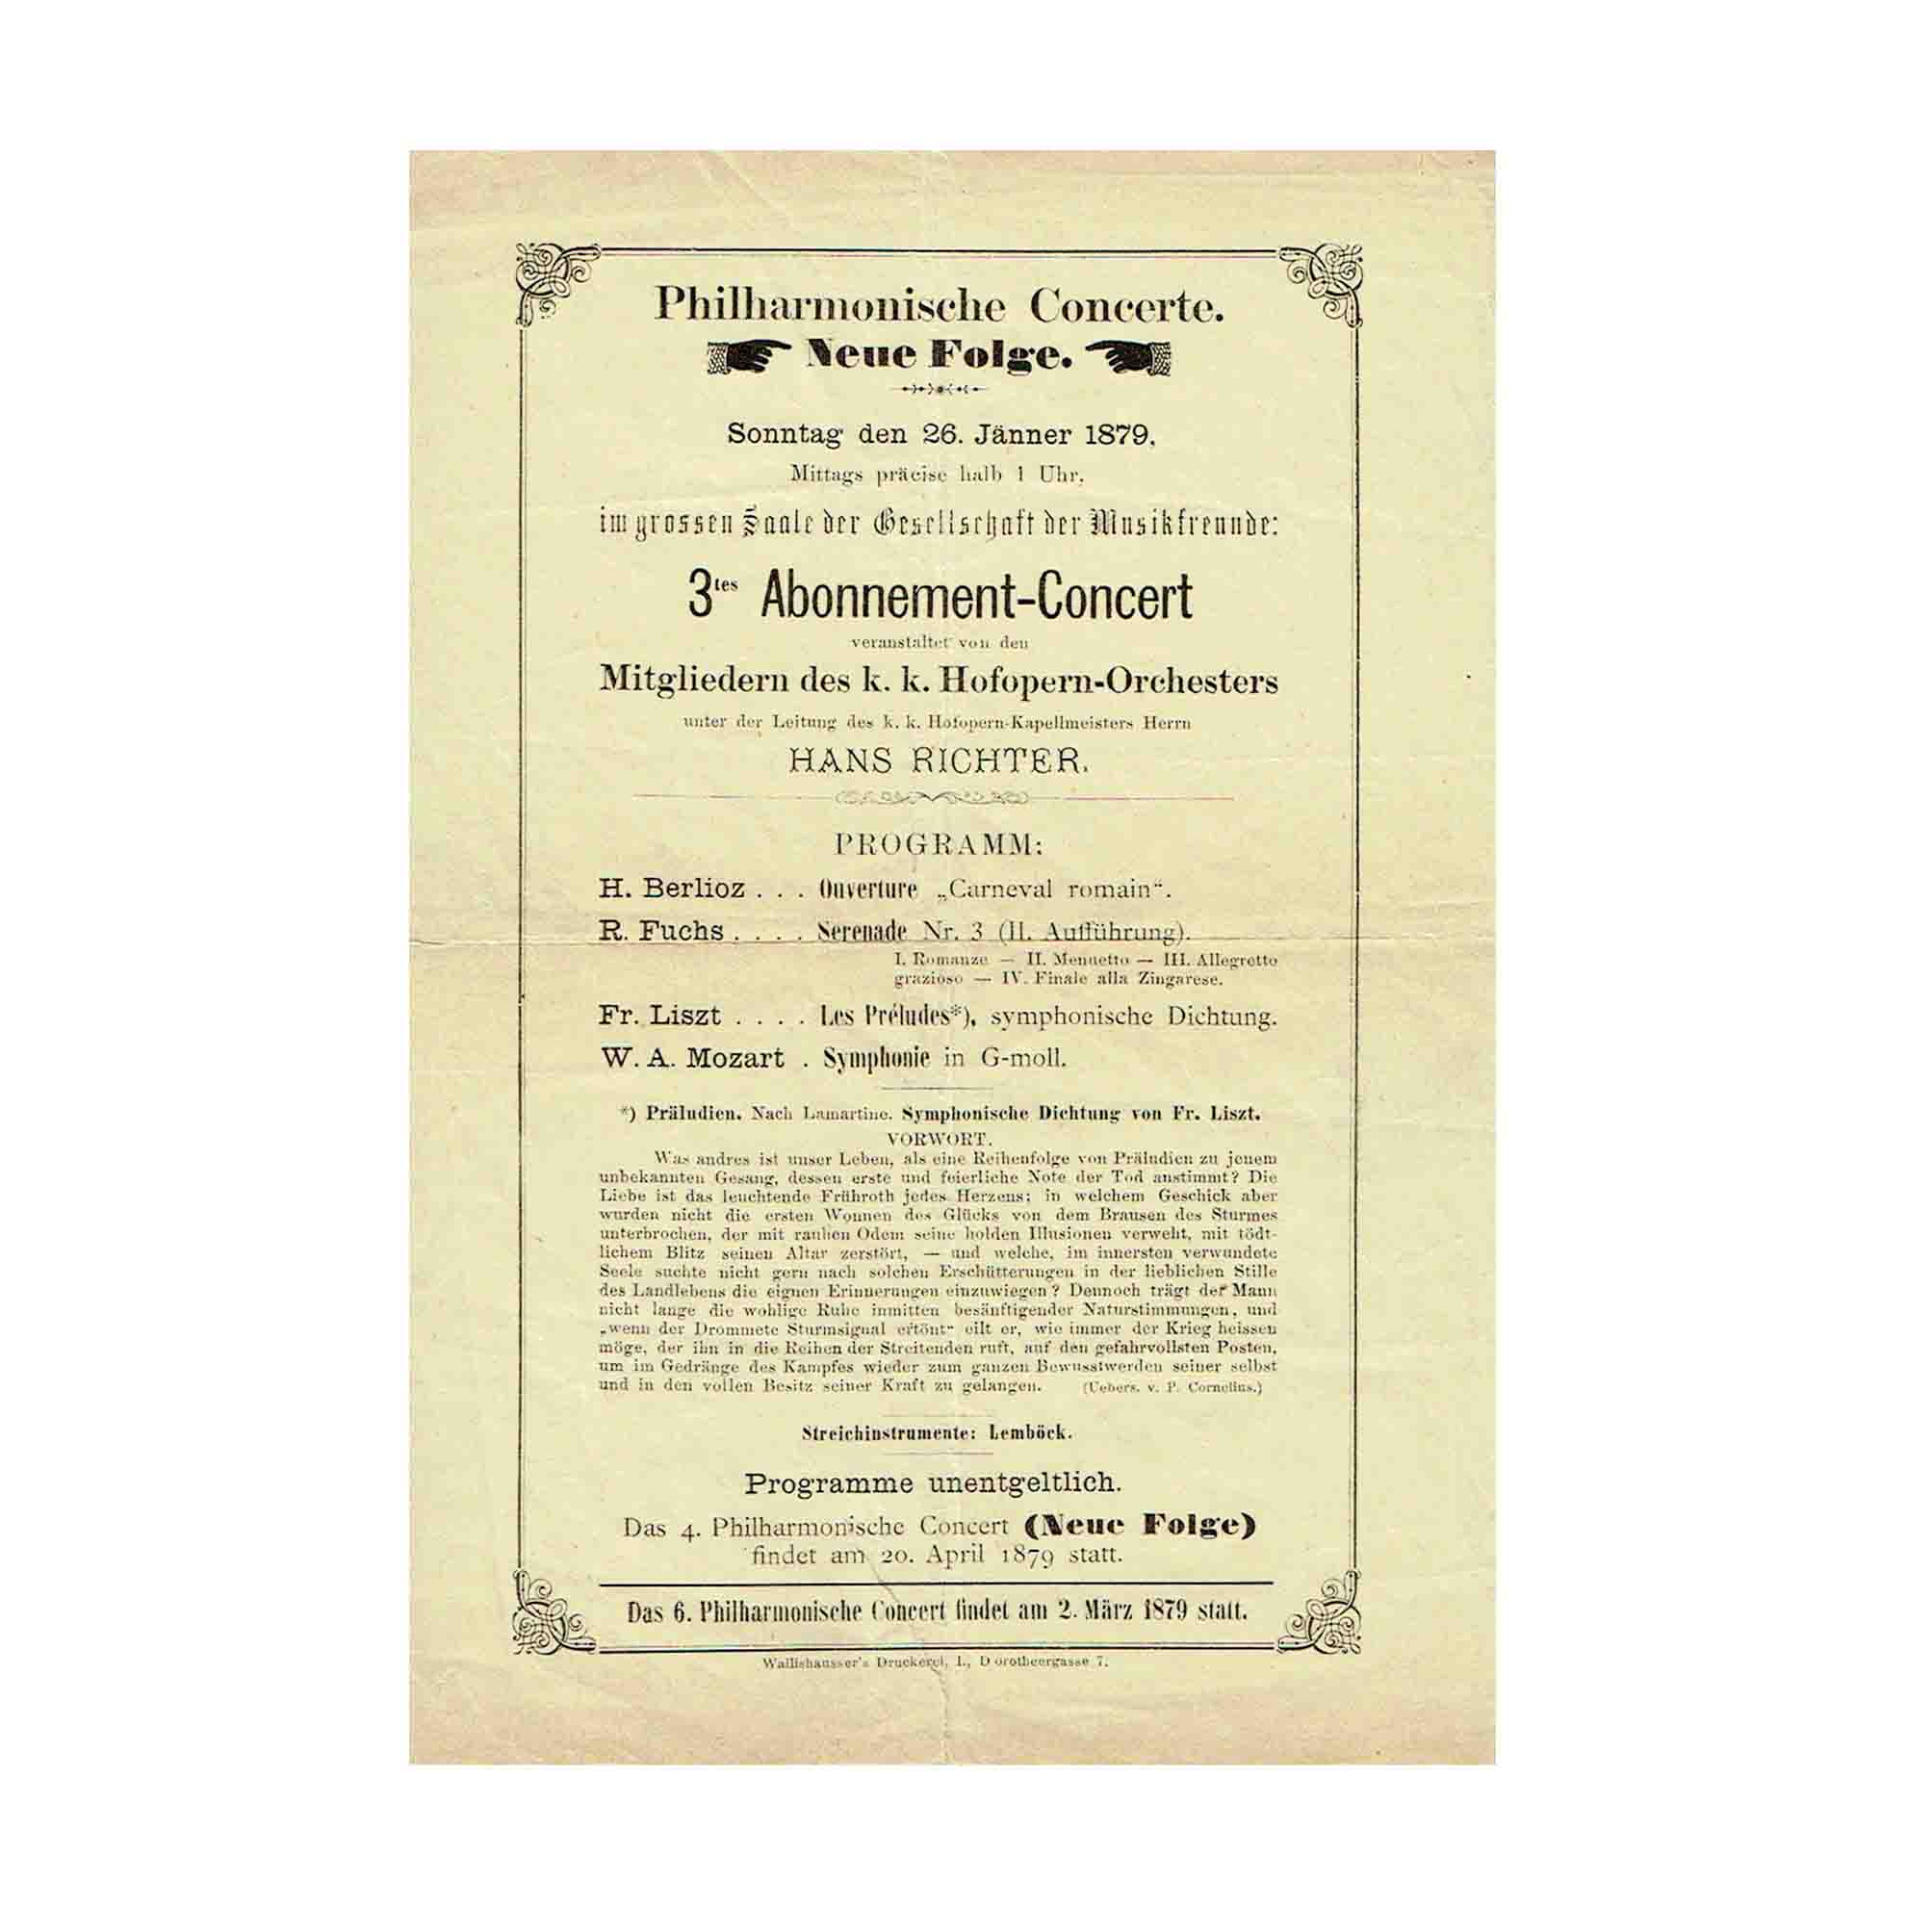 5481-Programmblatt-Musikverein-Konzert-Musikverein-26.-Jaenner-1879-N.jpeg